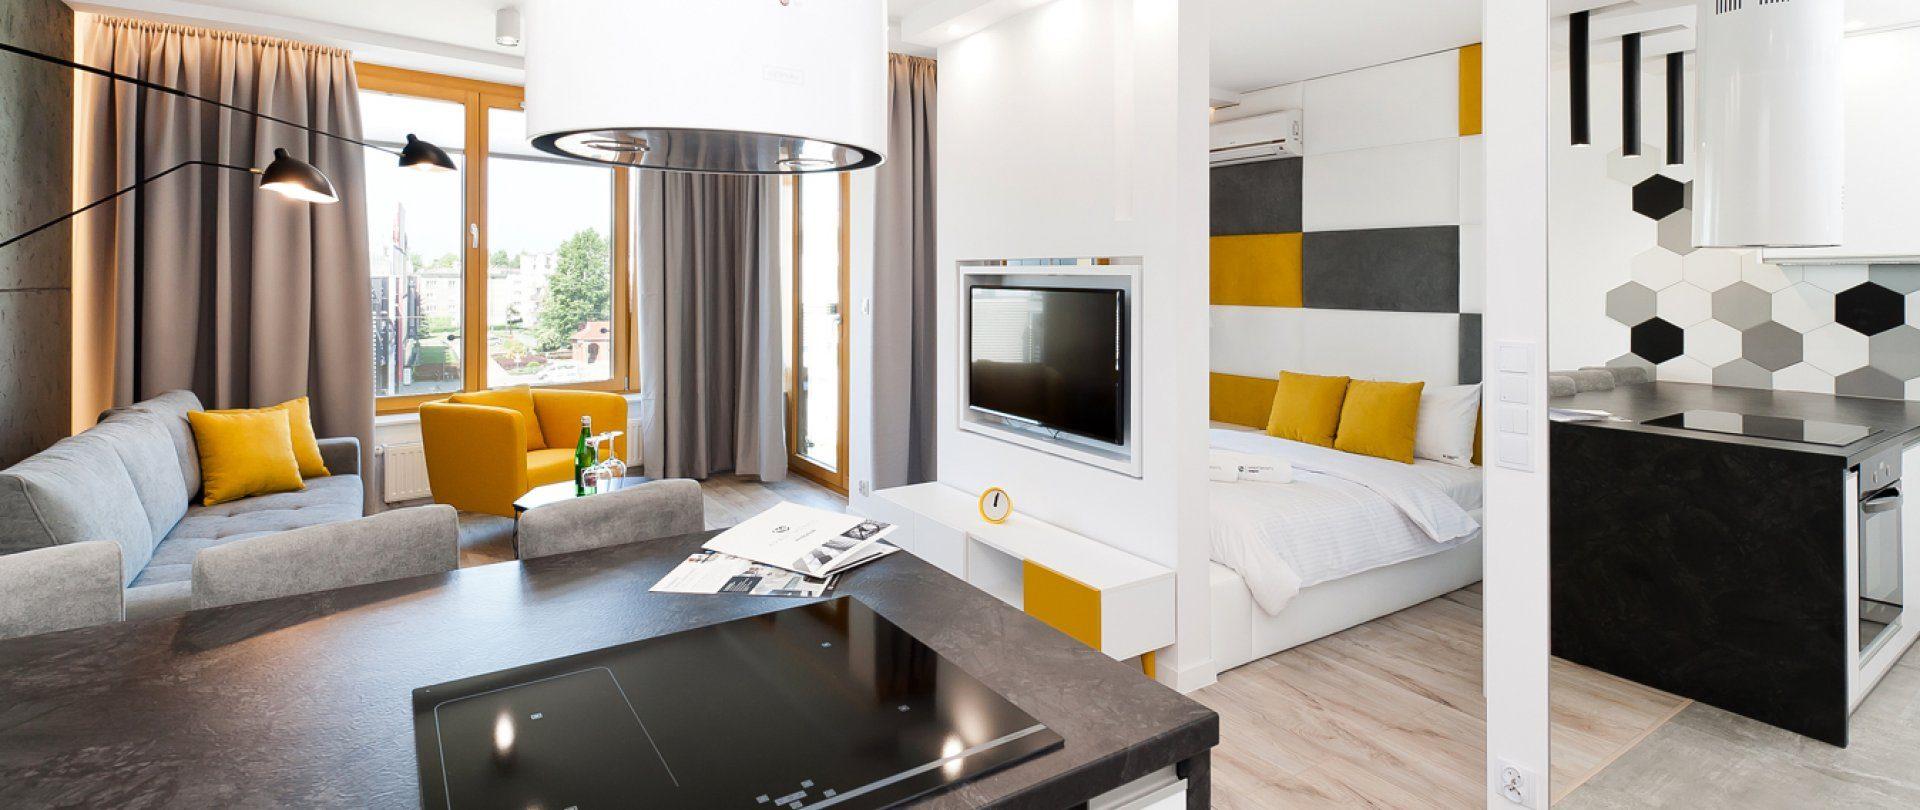 Bed&Bath Luxury Apartments, Kraków